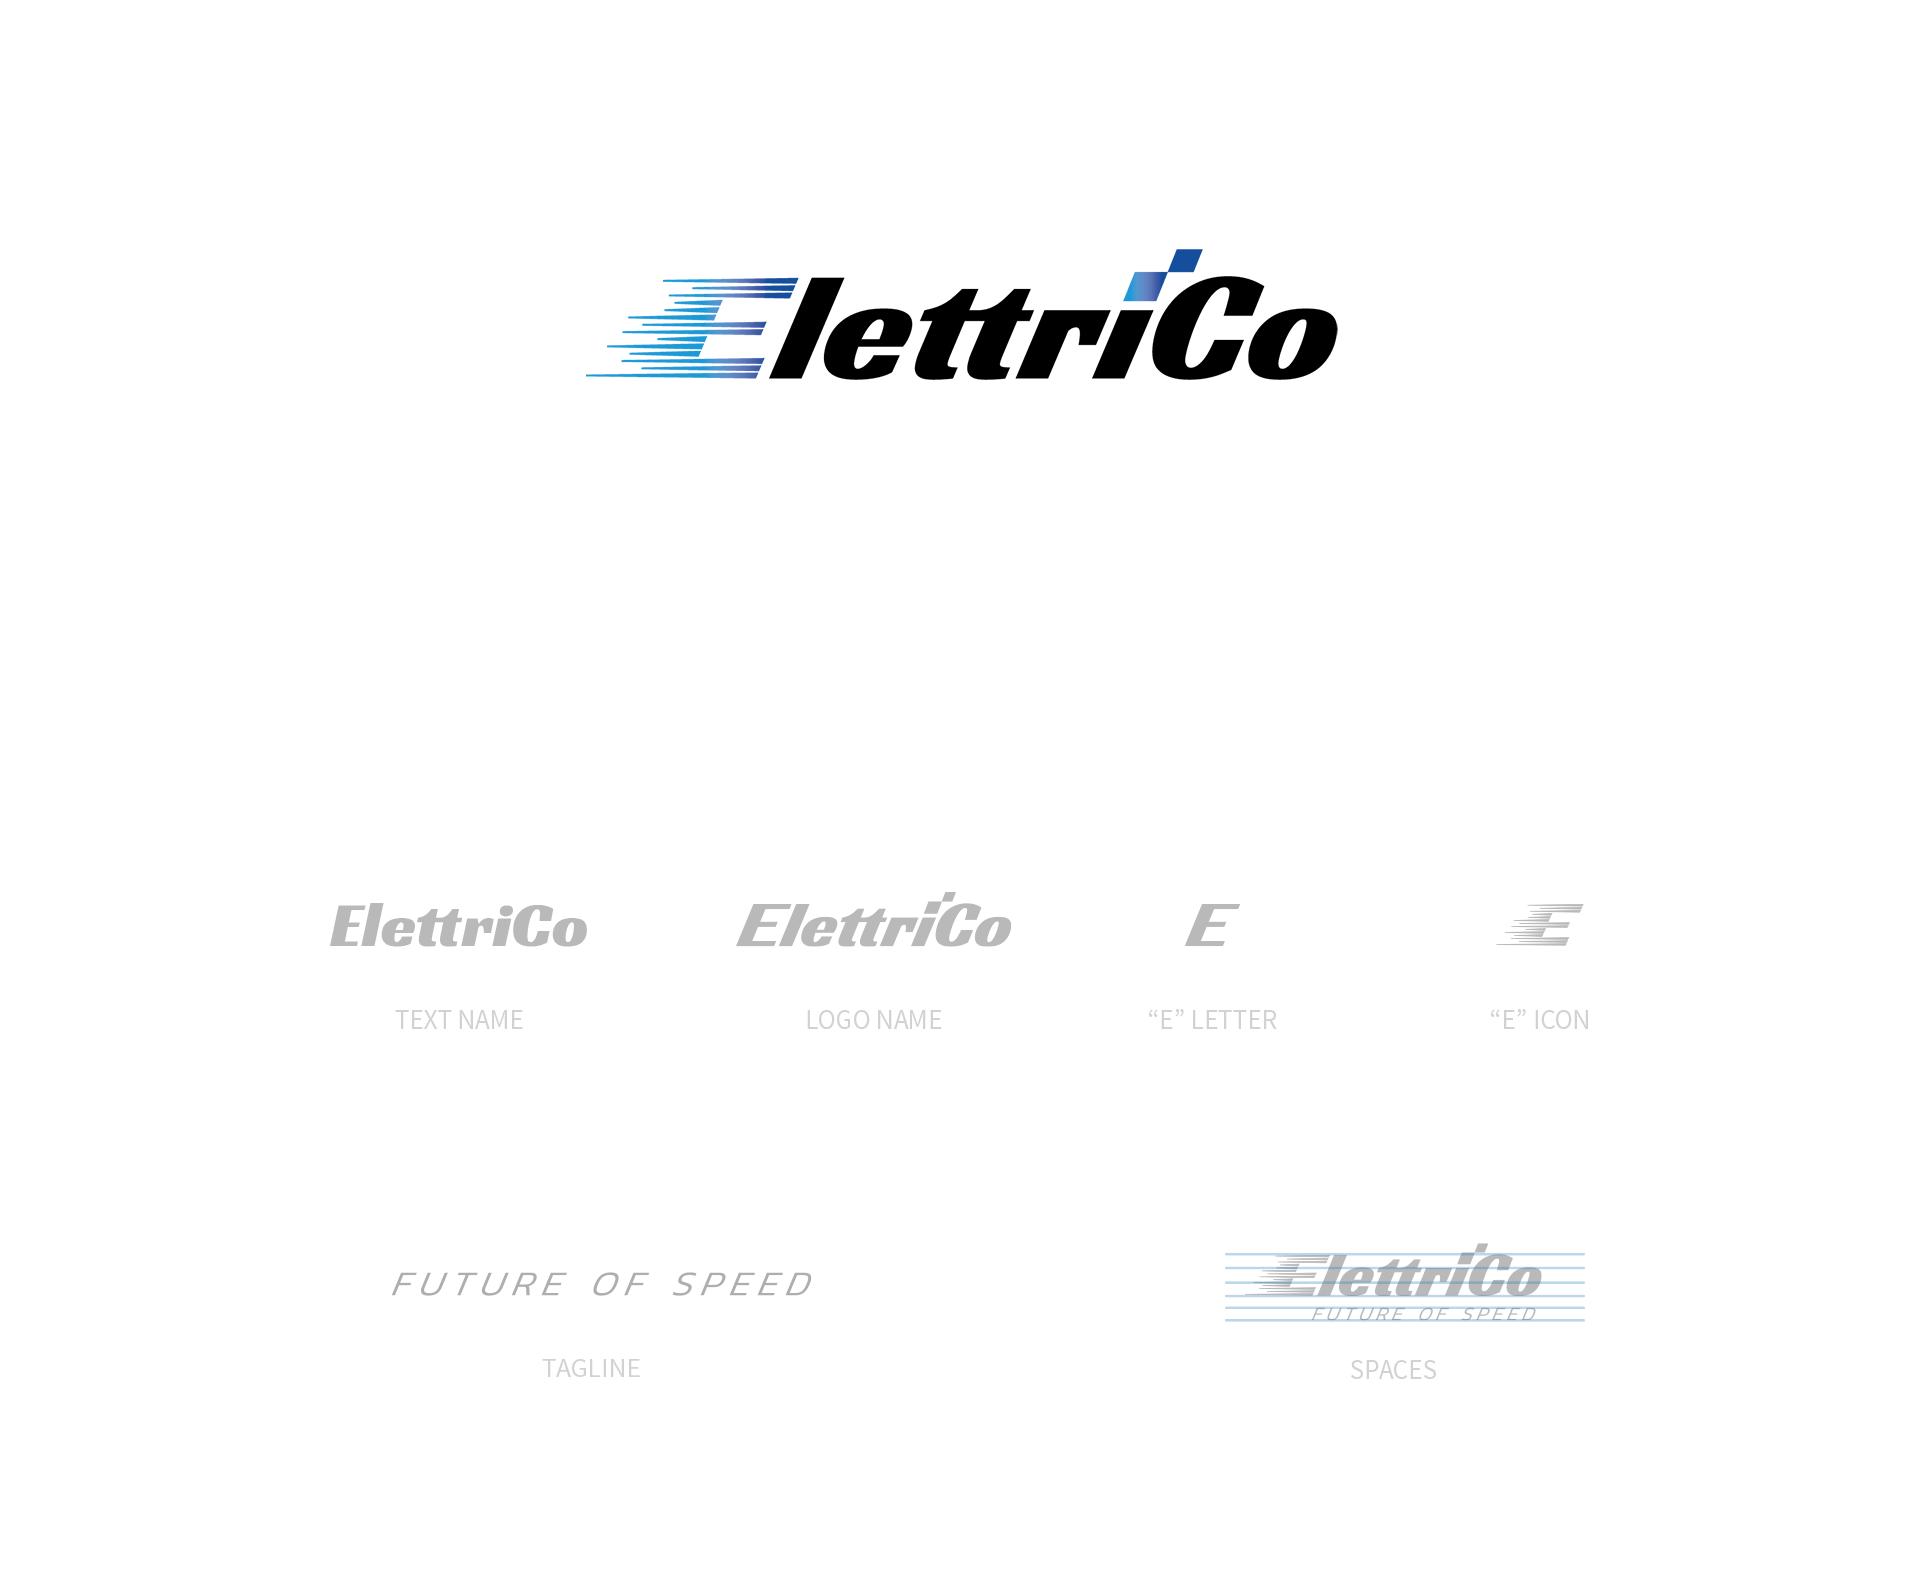 italian logo designer elettrico